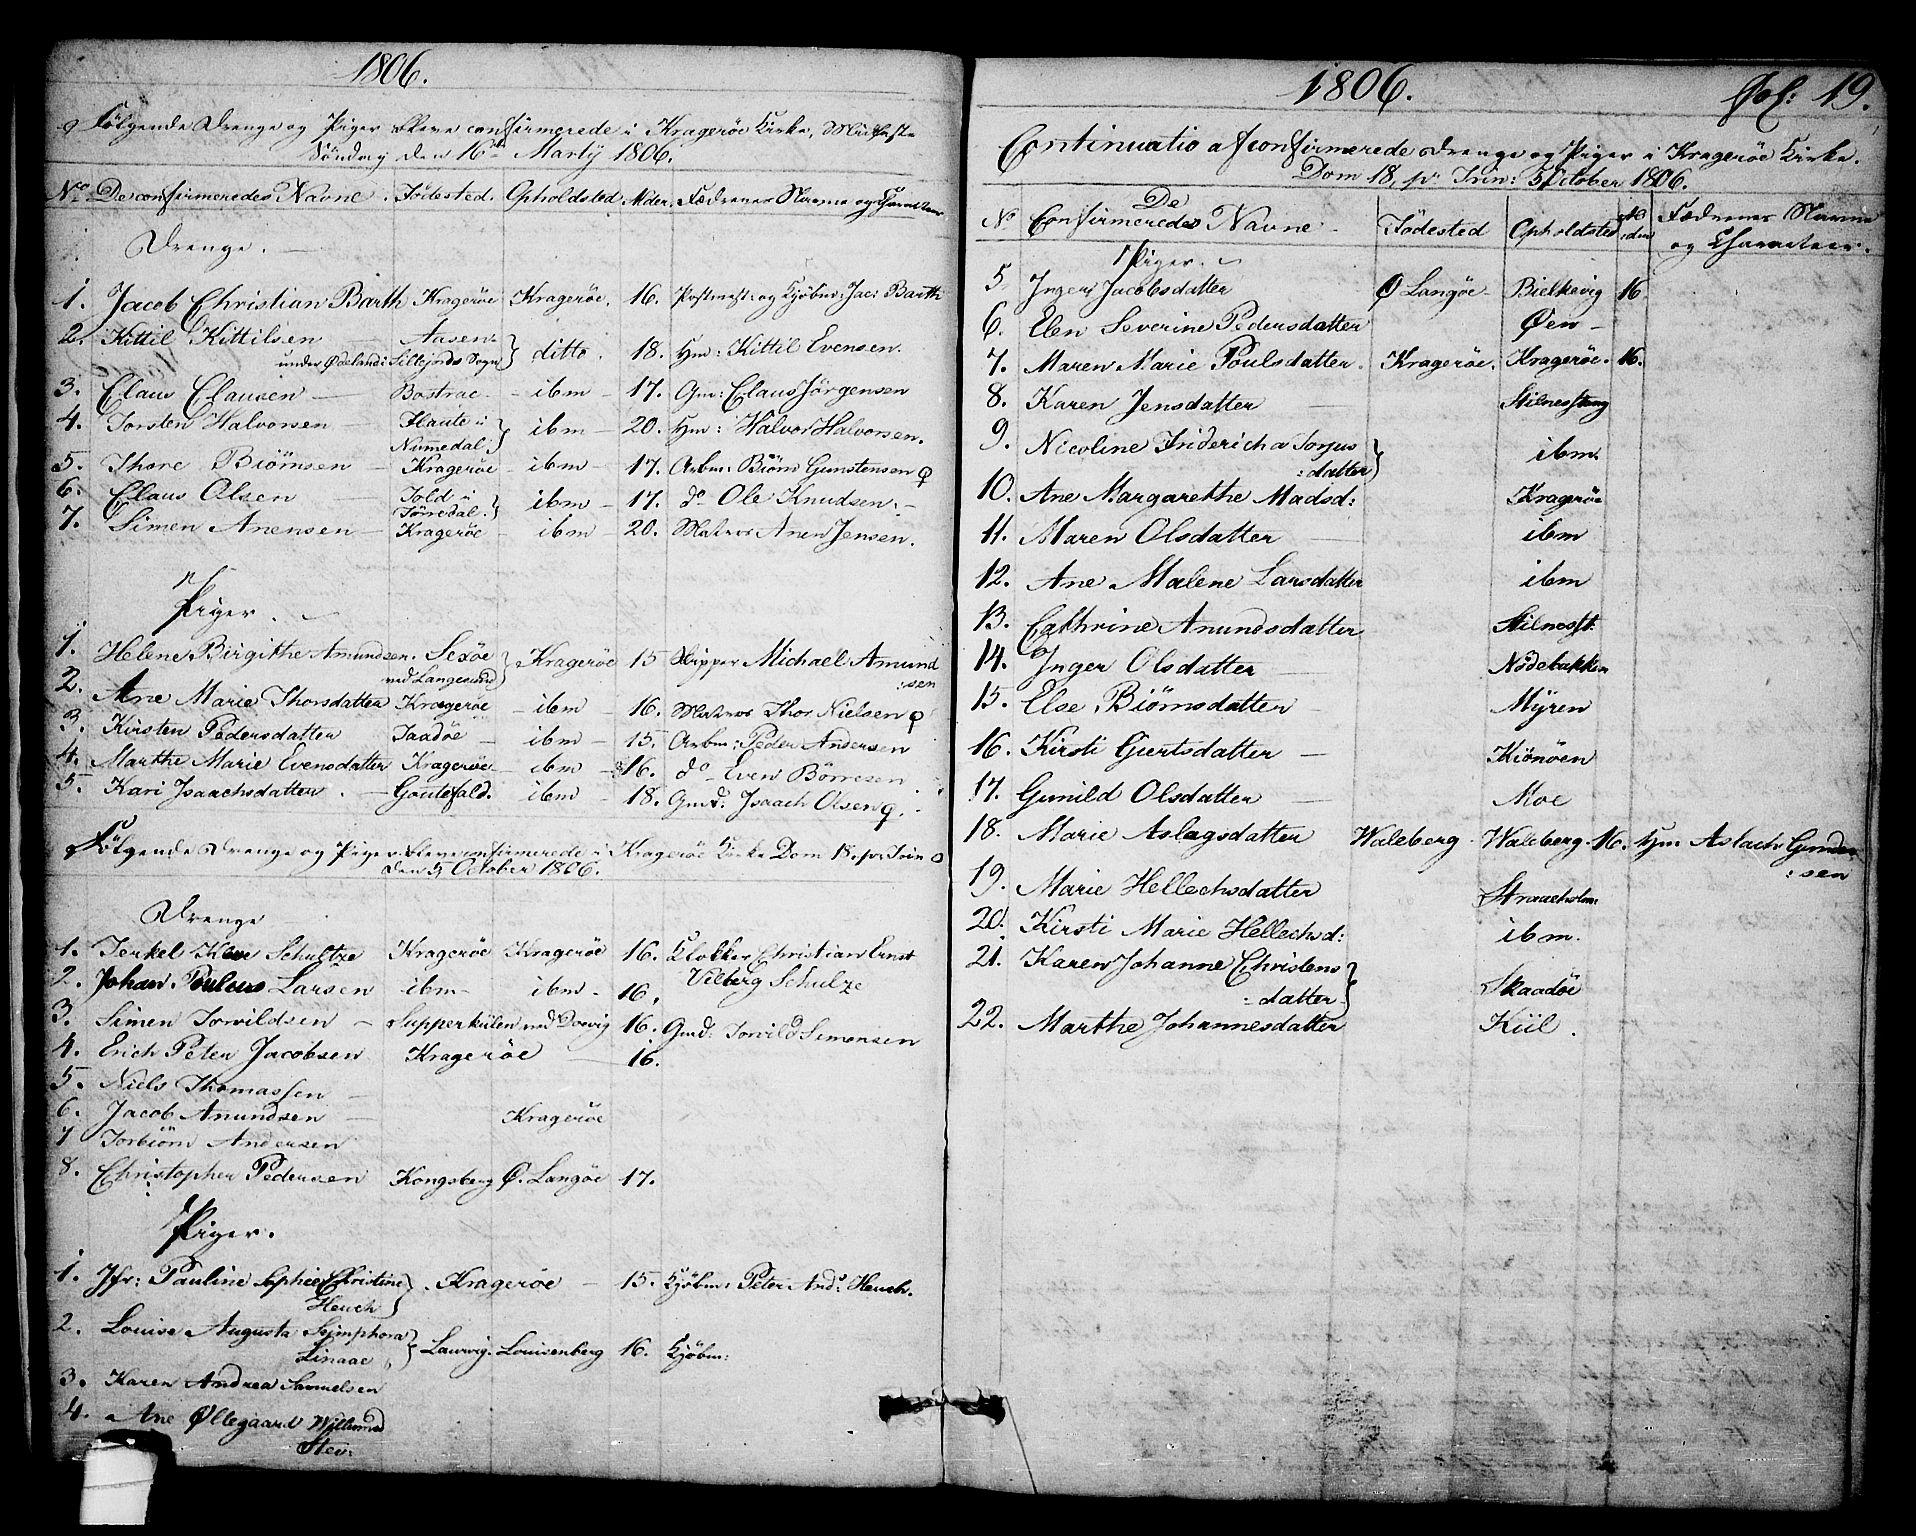 SAKO, Kragerø kirkebøker, F/Fa/L0003: Ministerialbok nr. 3, 1802-1813, s. 19